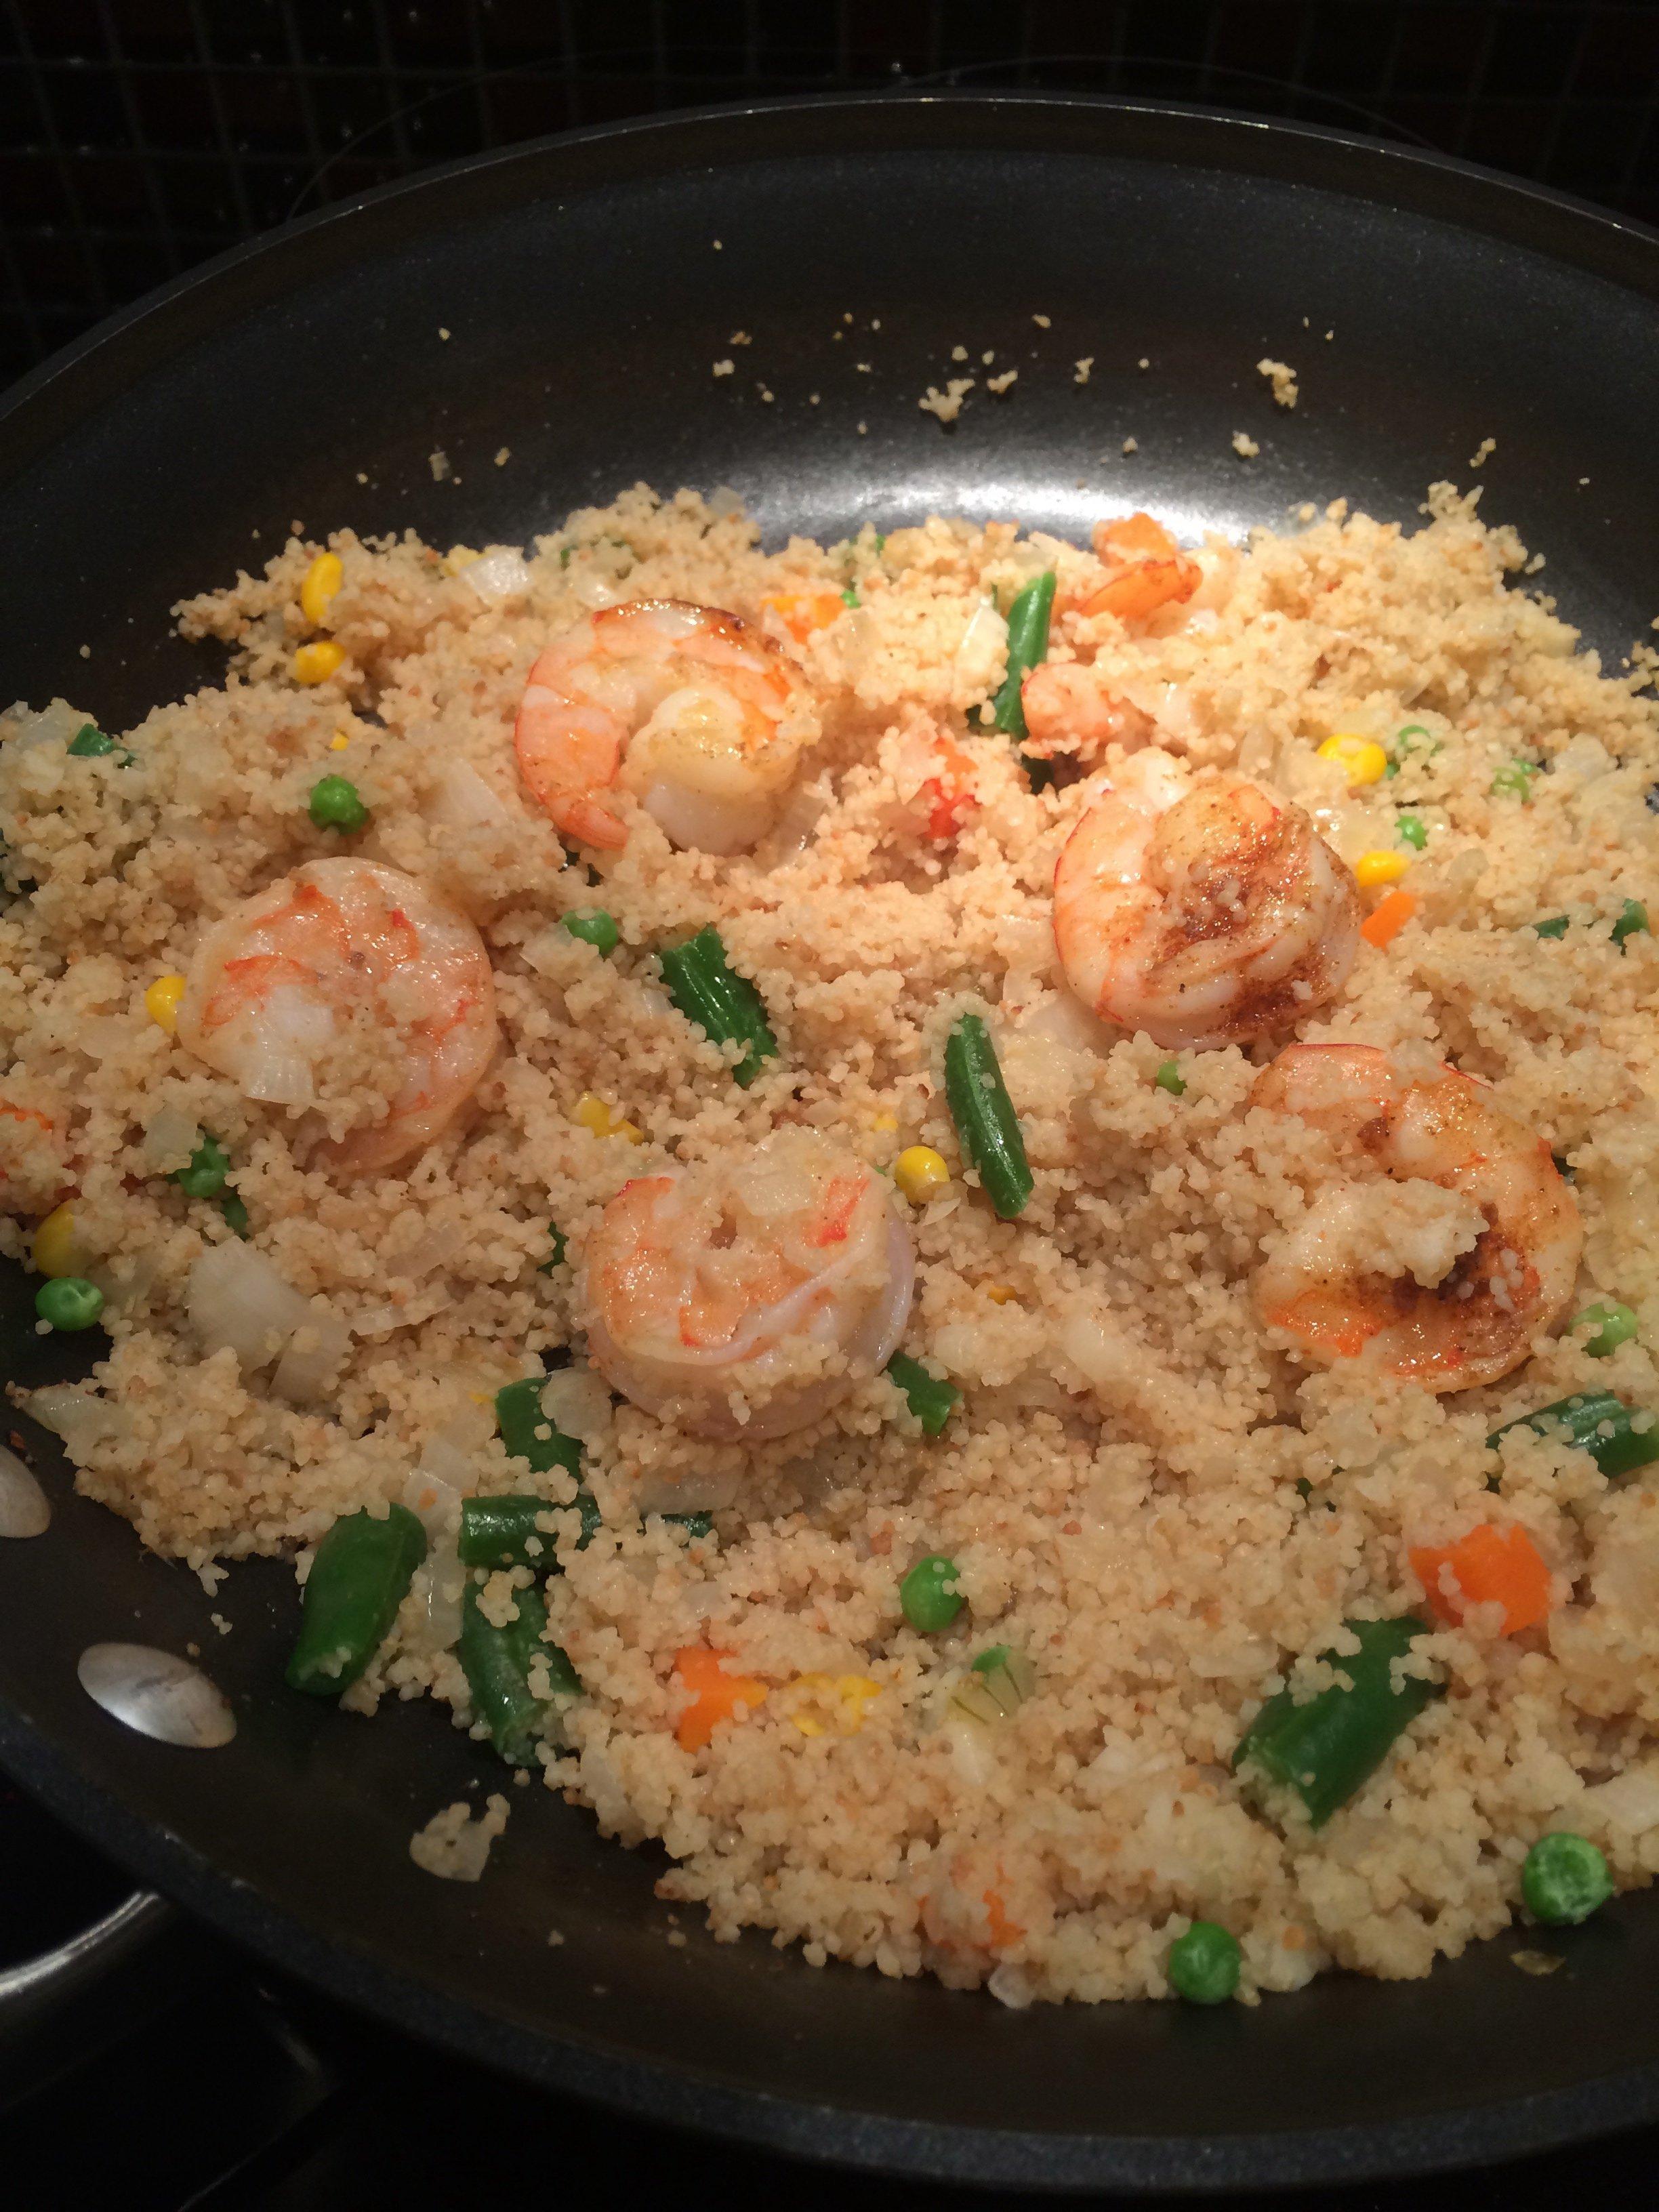 Shrimp And Vegetable Couscous Paella